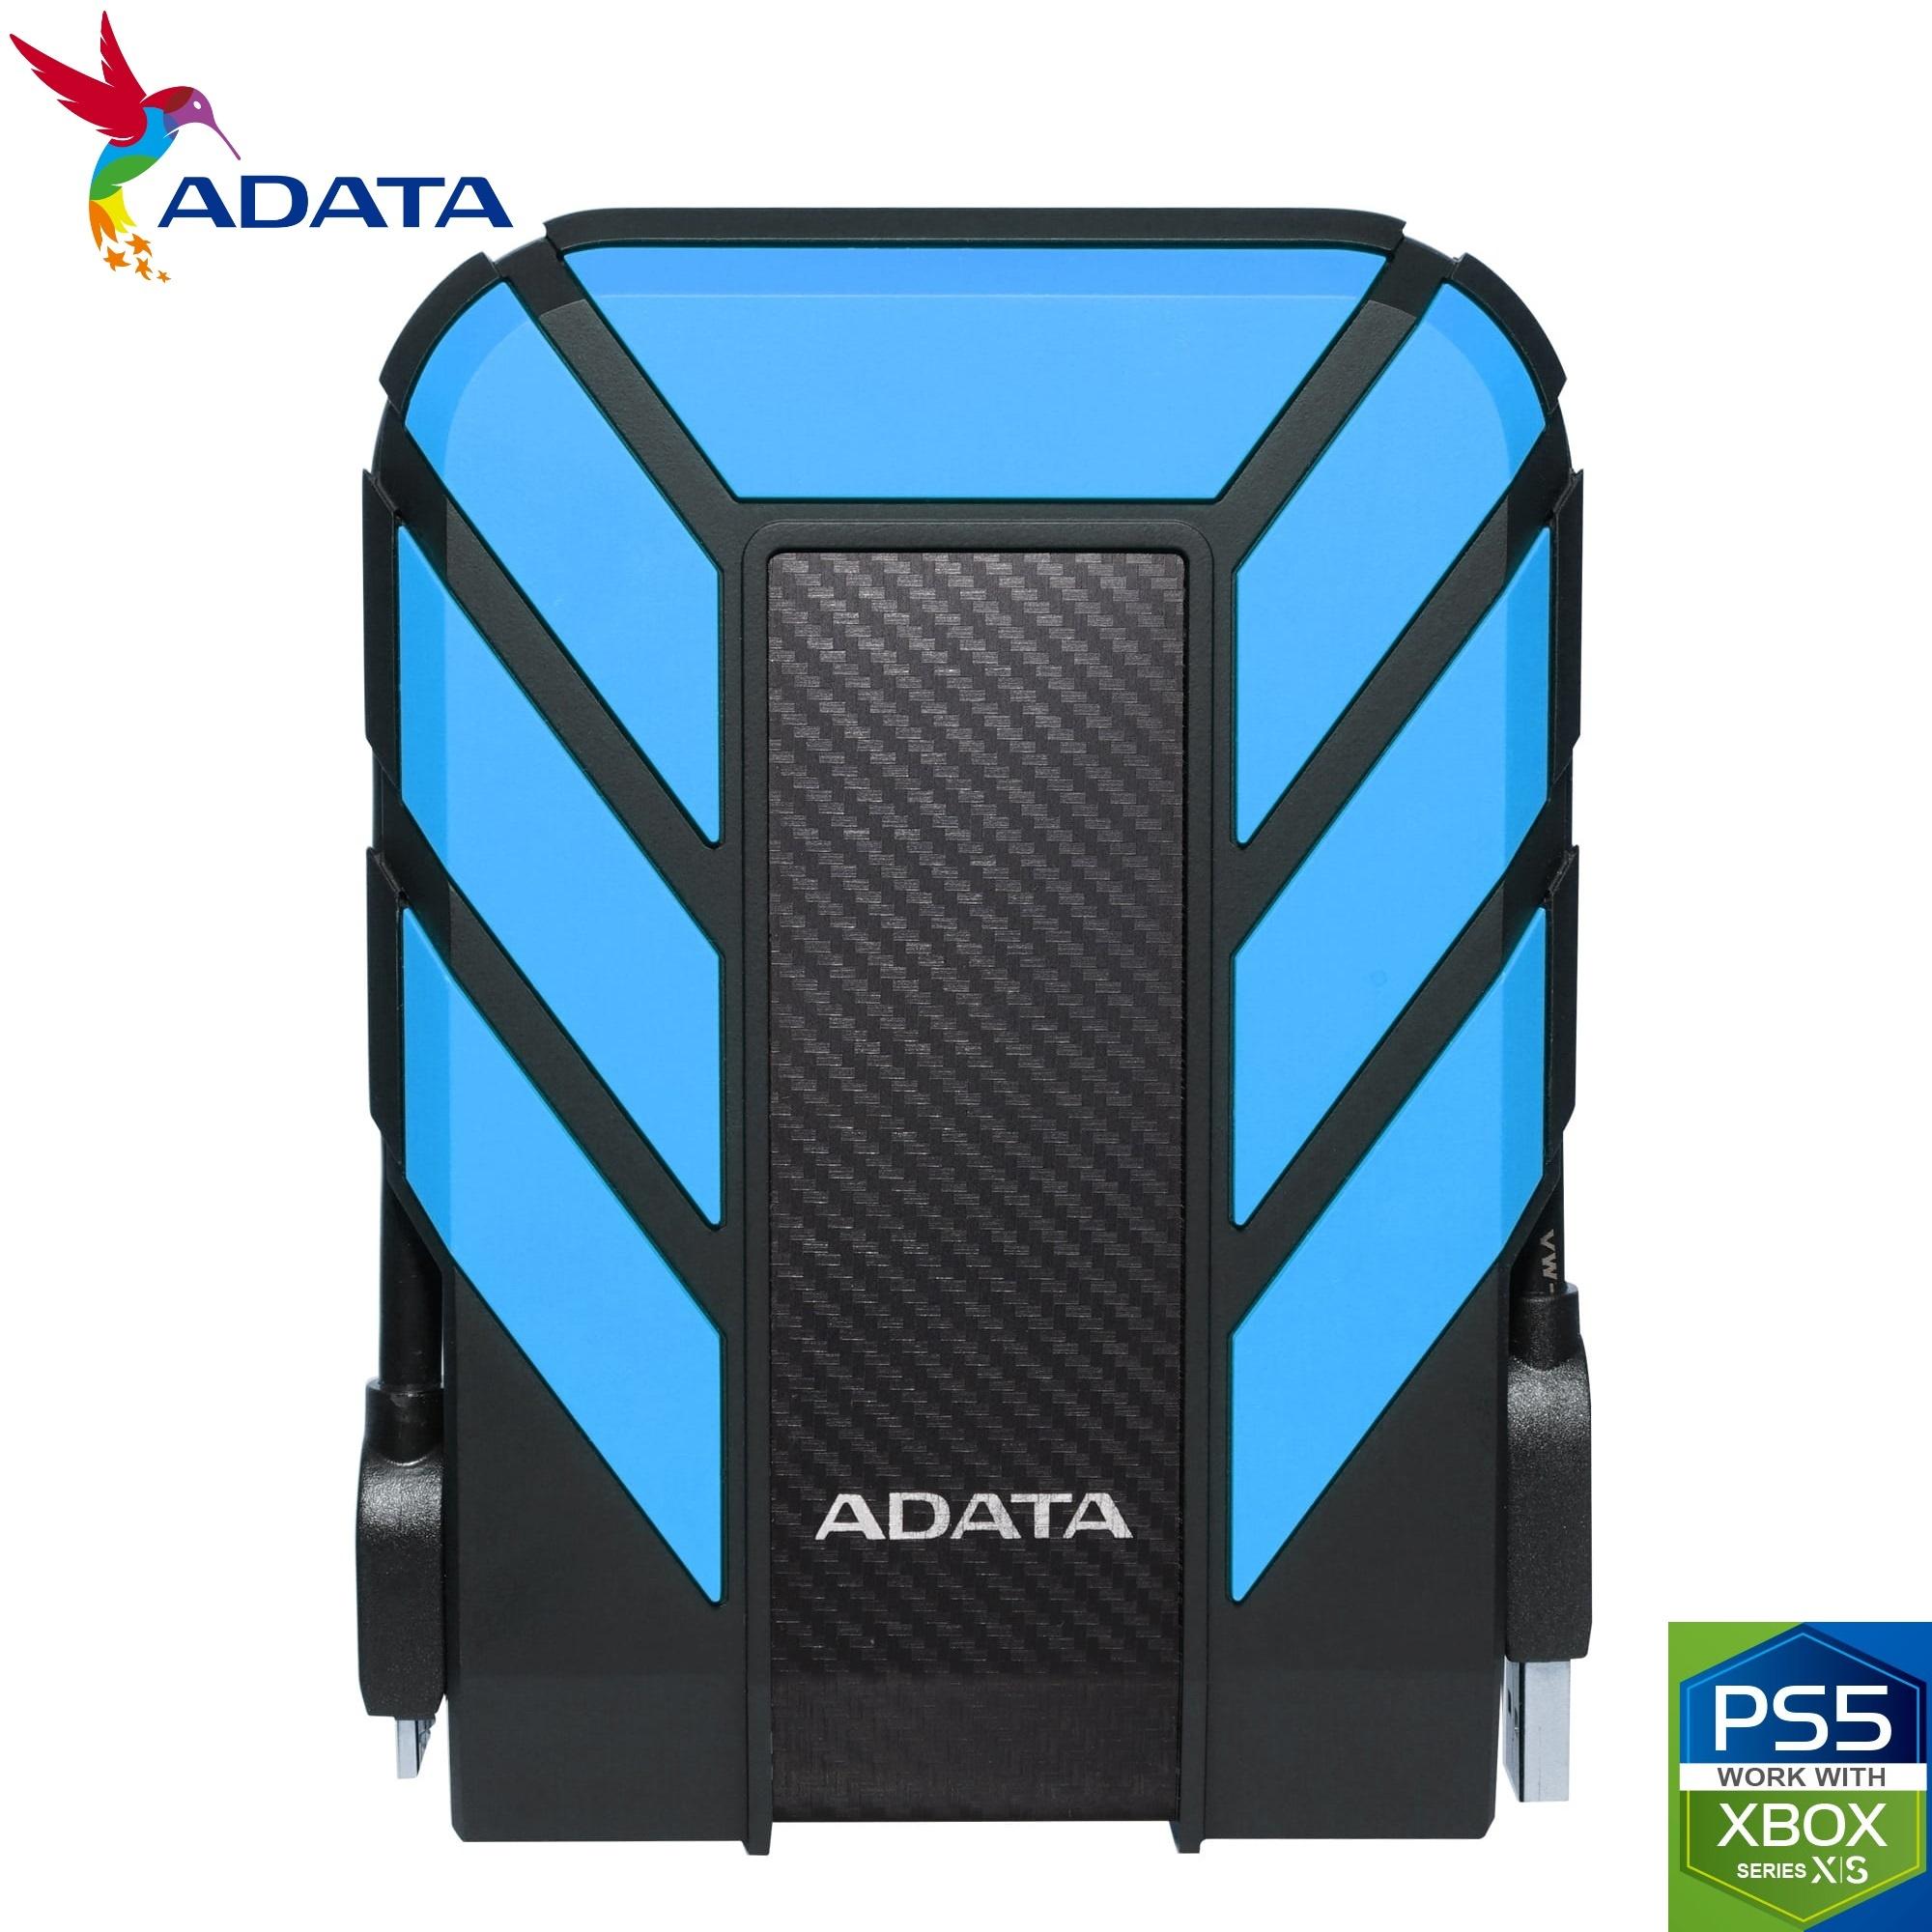 ADATA 2TB HD710 Pro USB 3.2 External Hard Drive Waterproof/Shockproof/Dustproof Ruggedized Blue